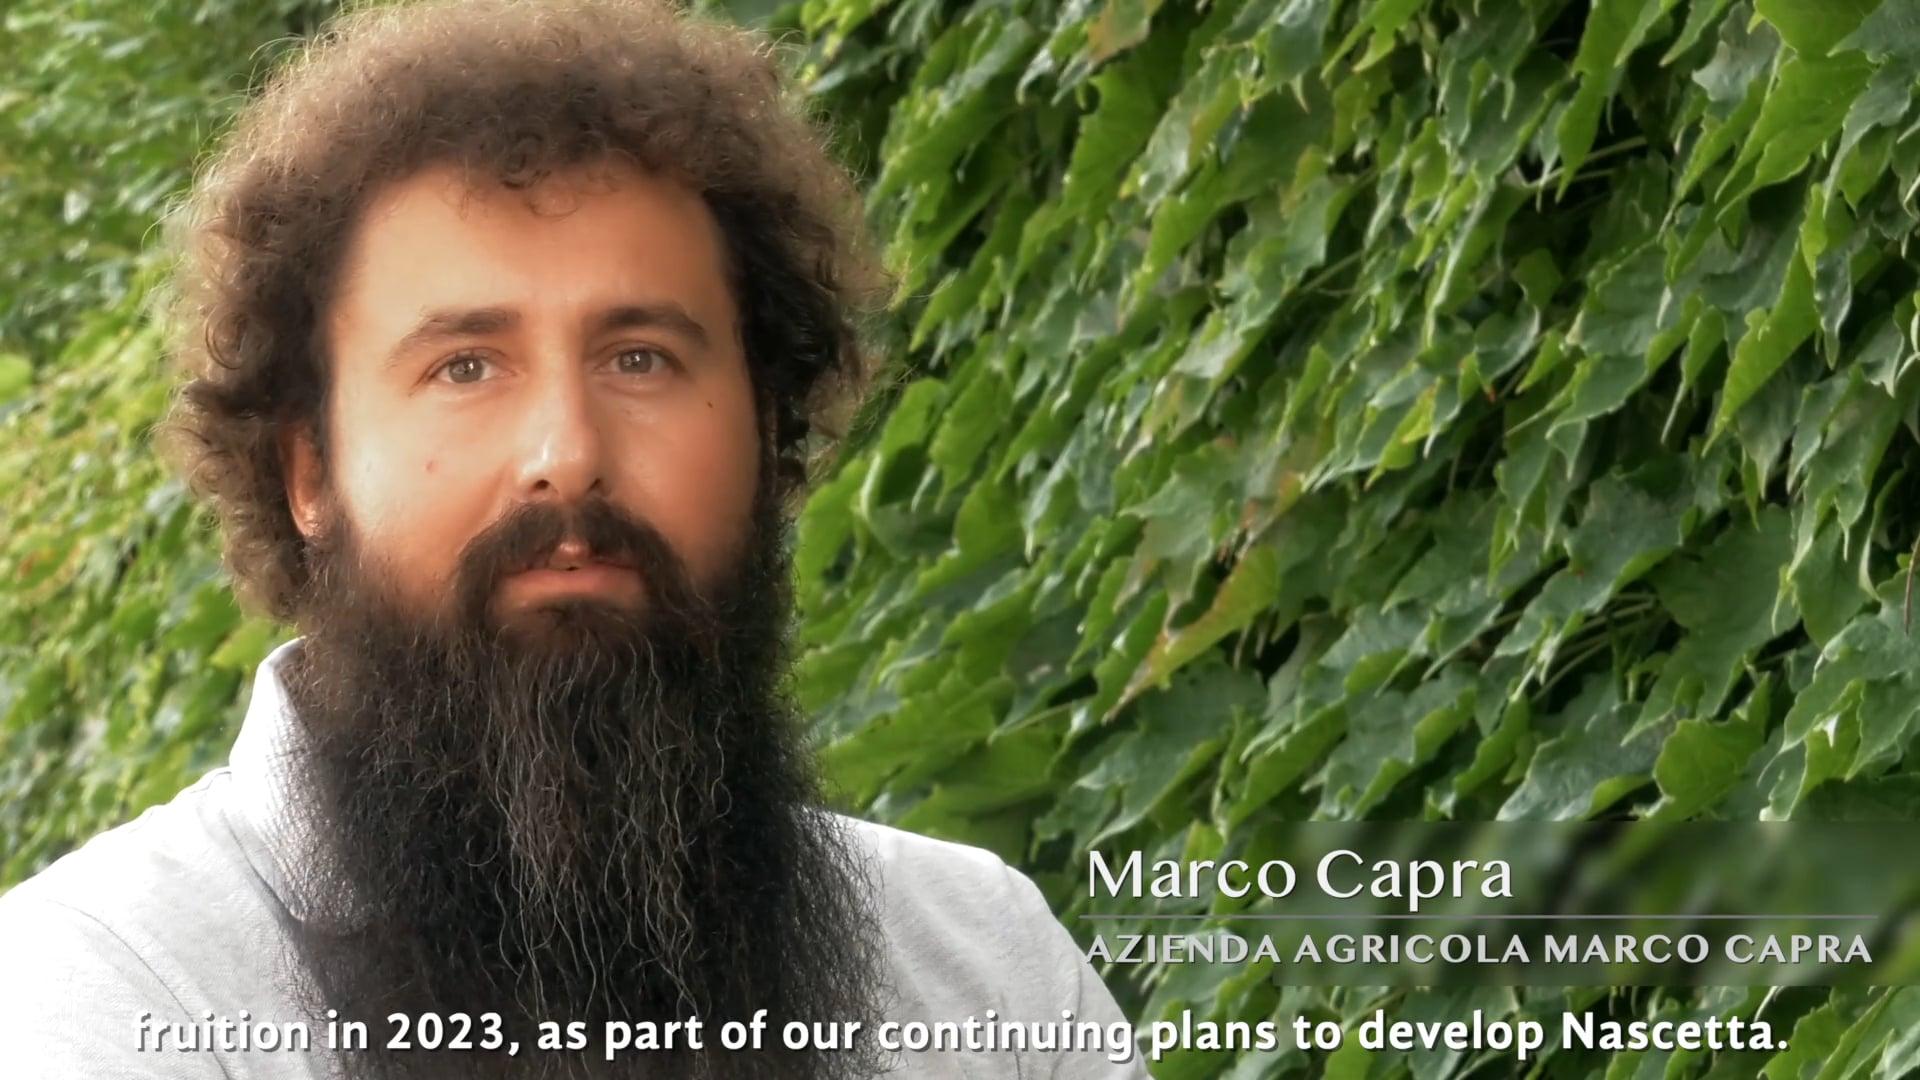 Azienda Agricola Marco Capra | Marco Capra